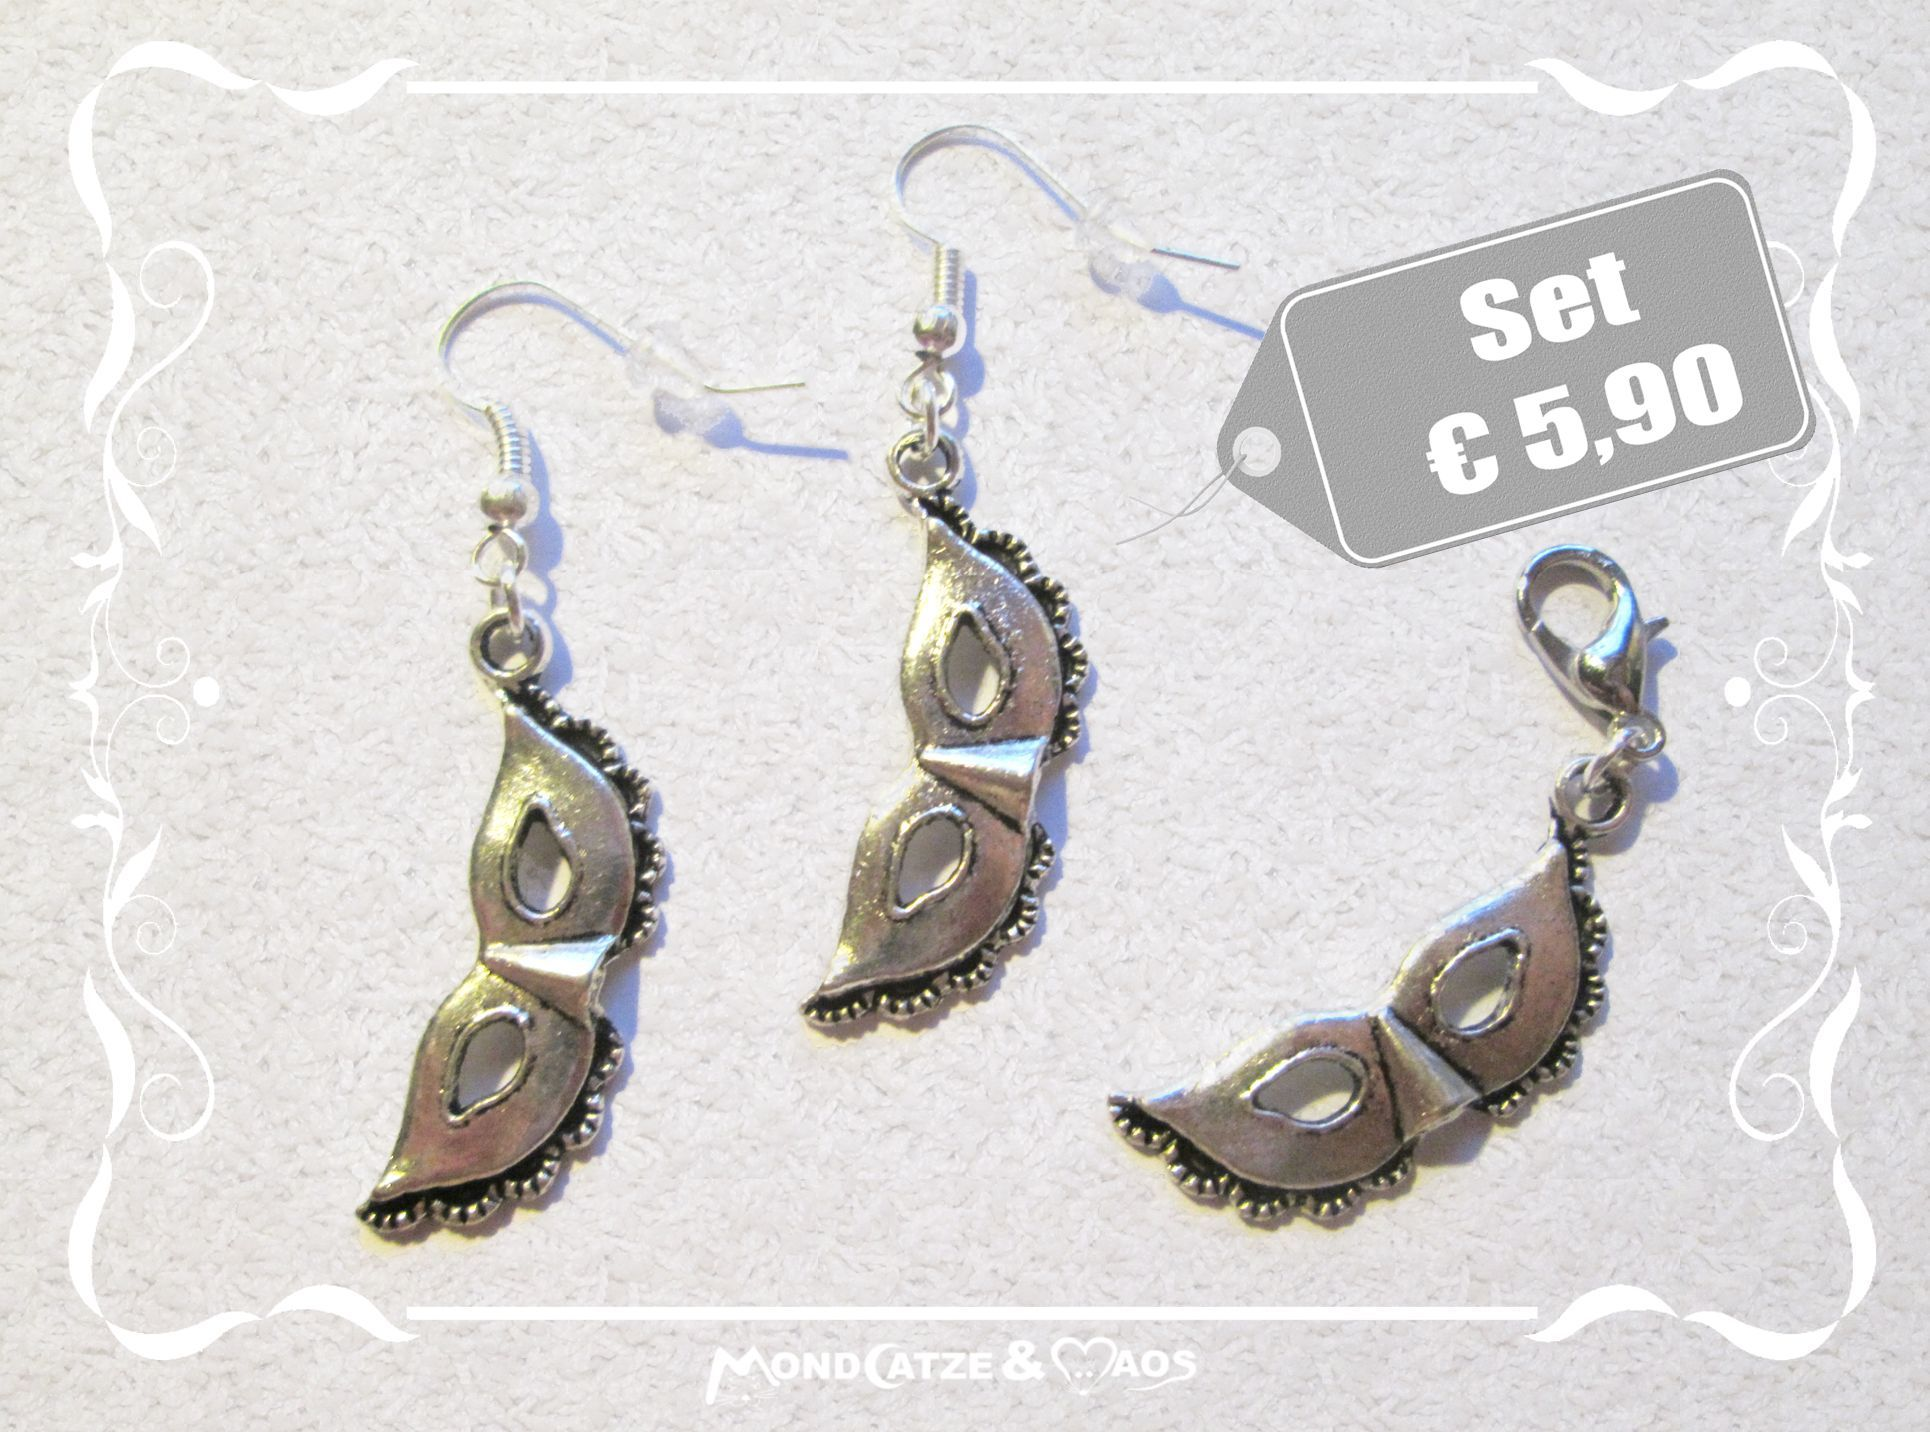 c034 MASKEN, (wanna buy something like this? Earrings, (Earhooks) or Charms? ask me: Mondcatze@fantasymail.de)